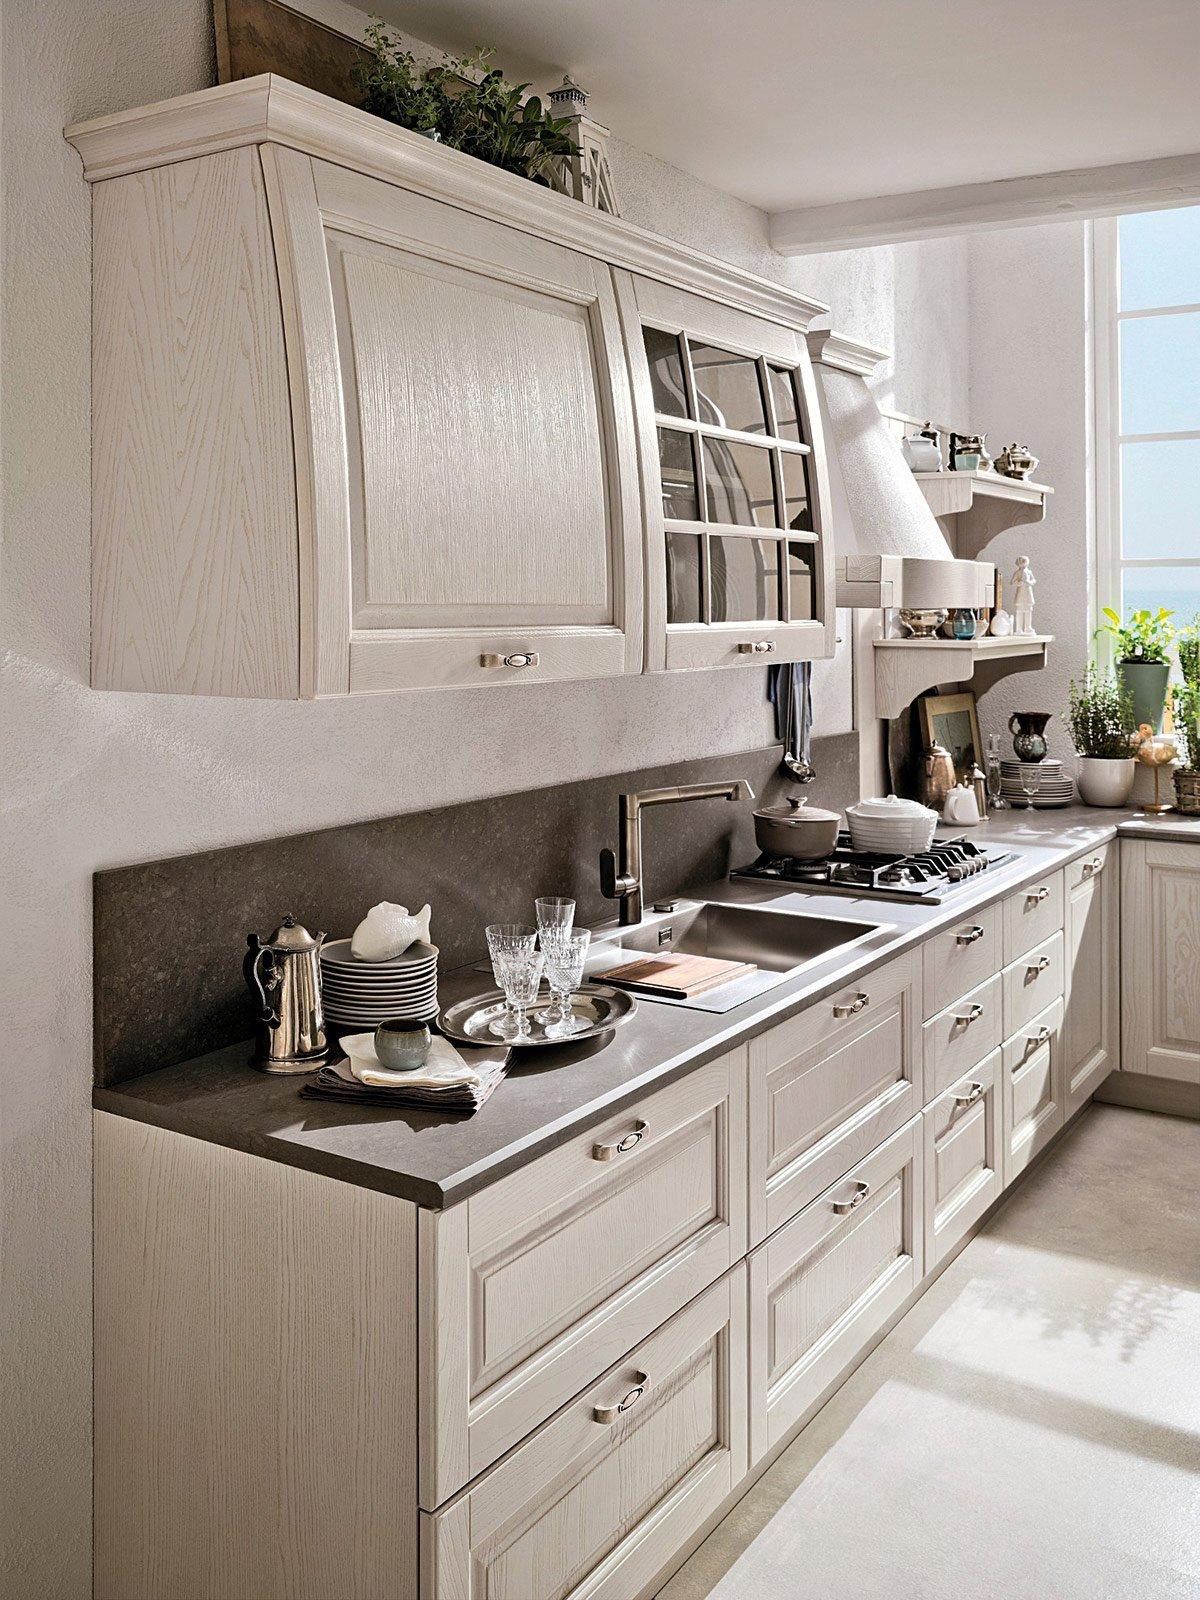 Cucine country stile tradizionale o new classic cose di - Profondita pensili cucina ...